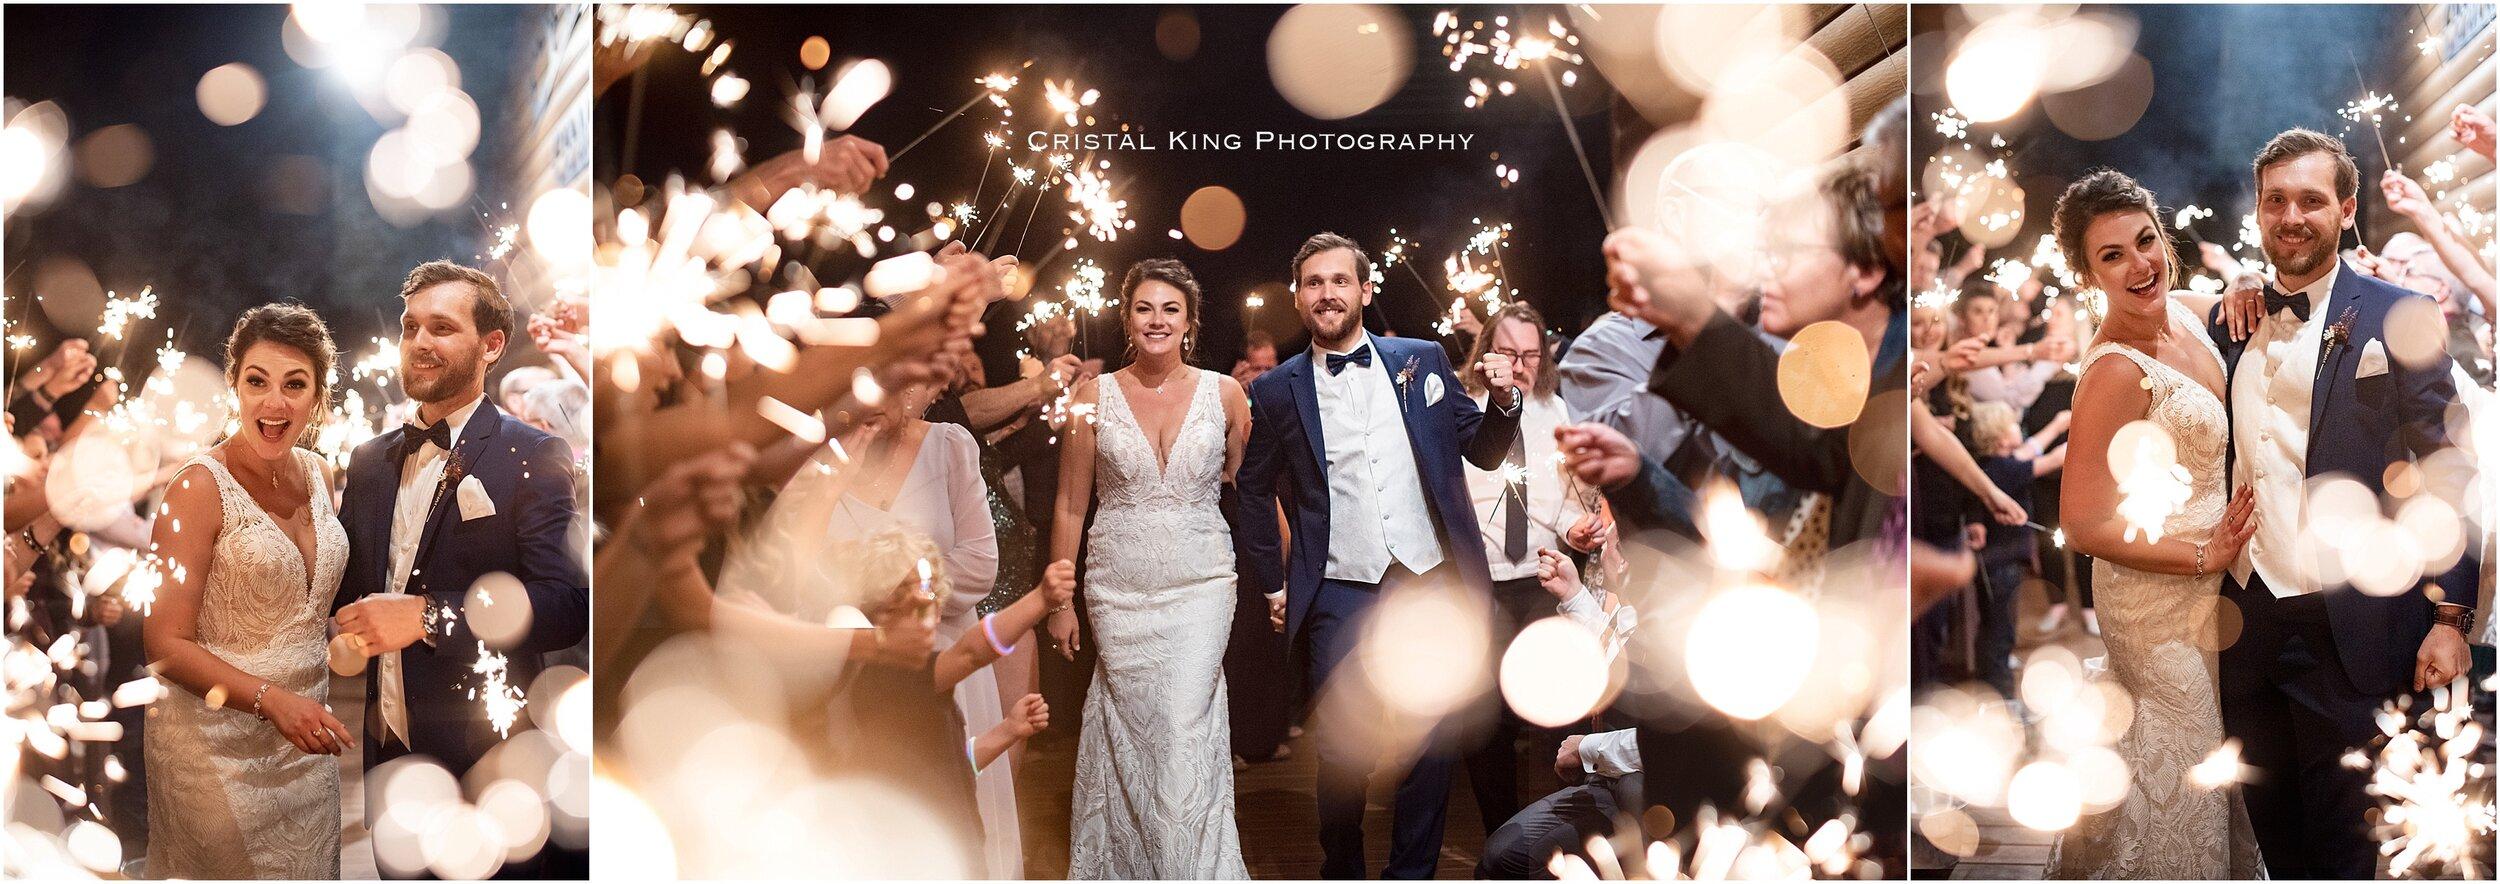 Sarah & Shaun's Wedding-187.jpg